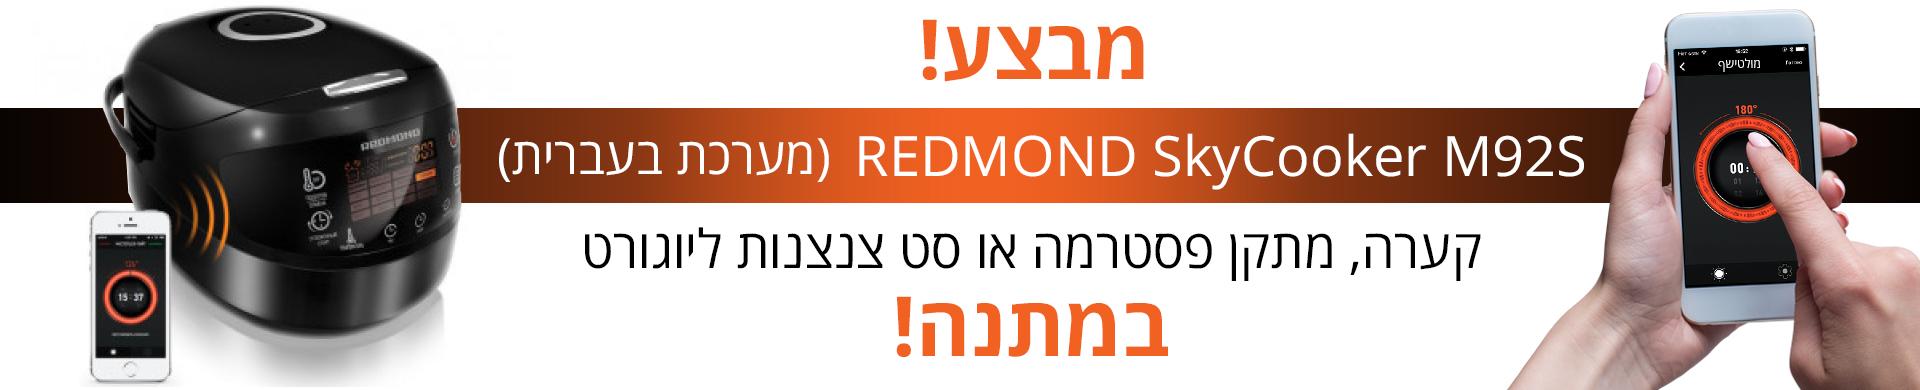 redmond_he_13_03_17